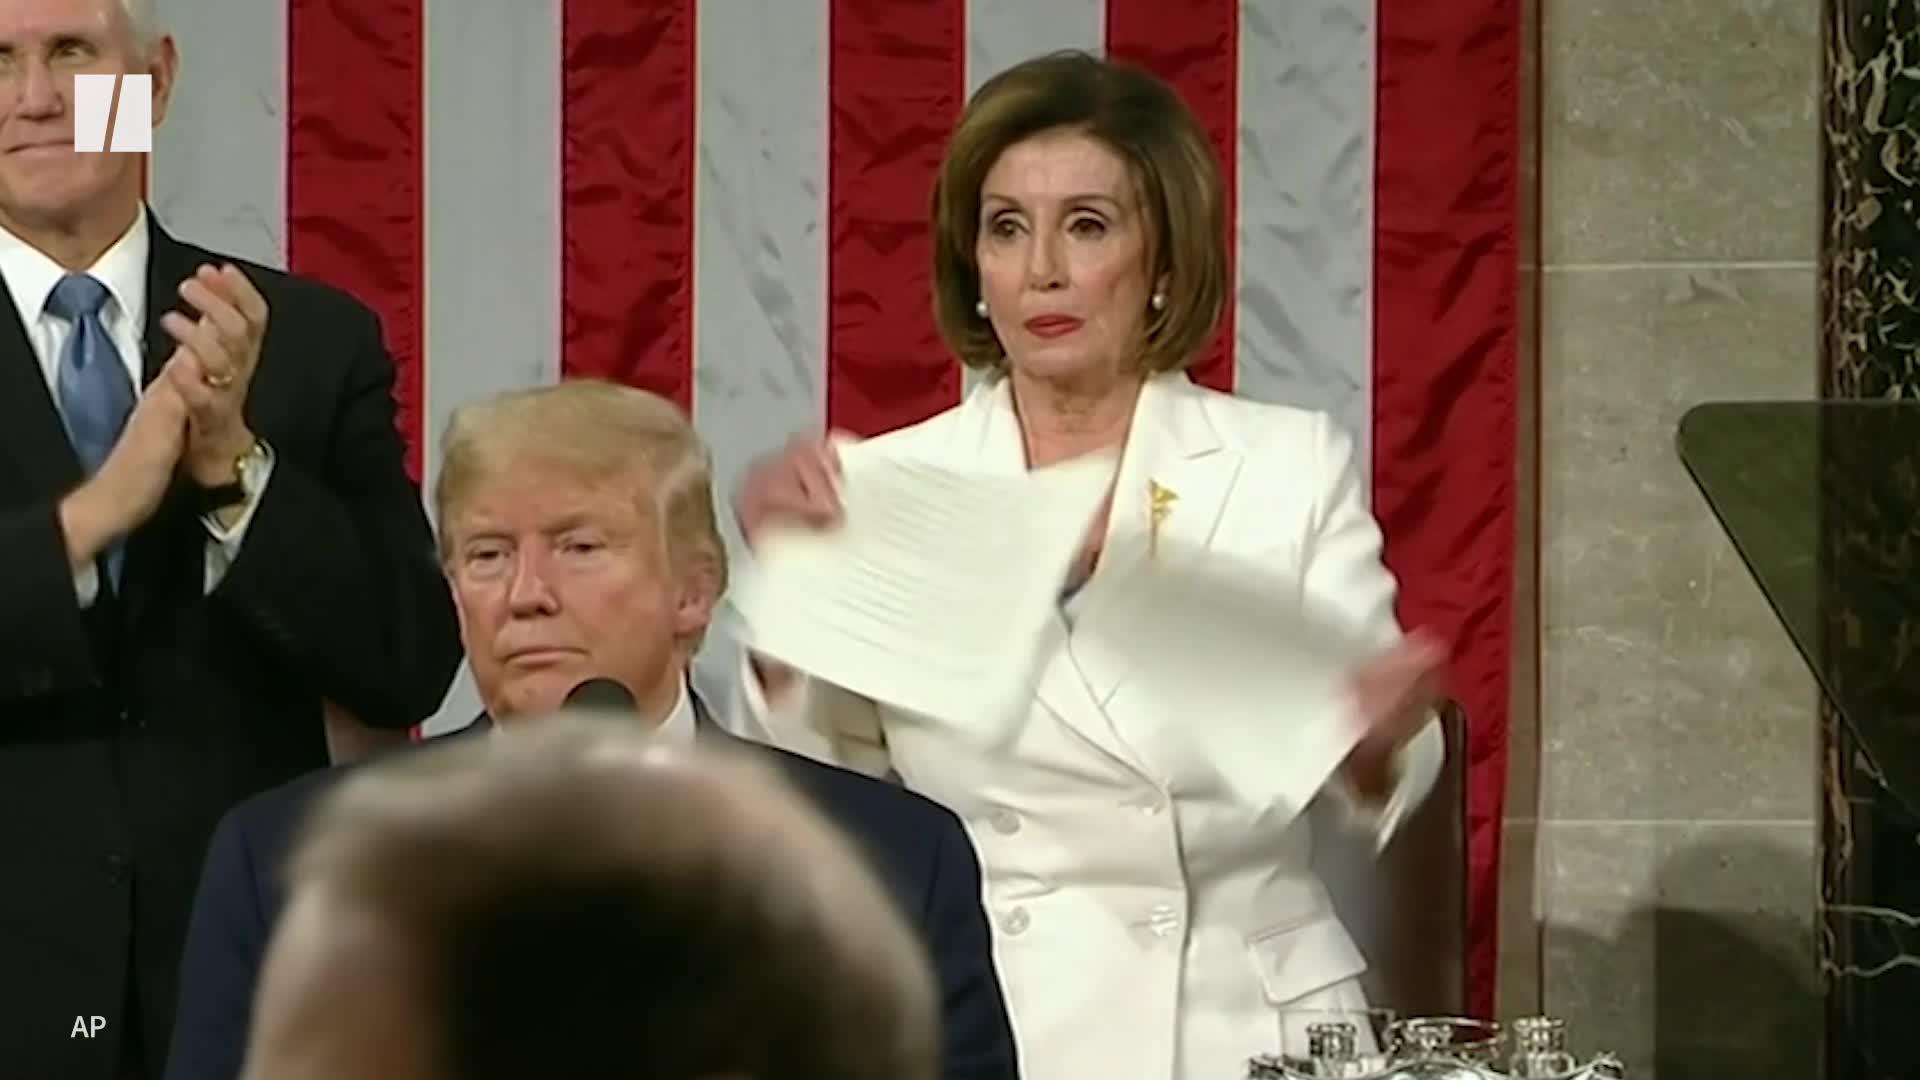 Nancy Pelosi Rips Up Trump's State Of The Union Speech